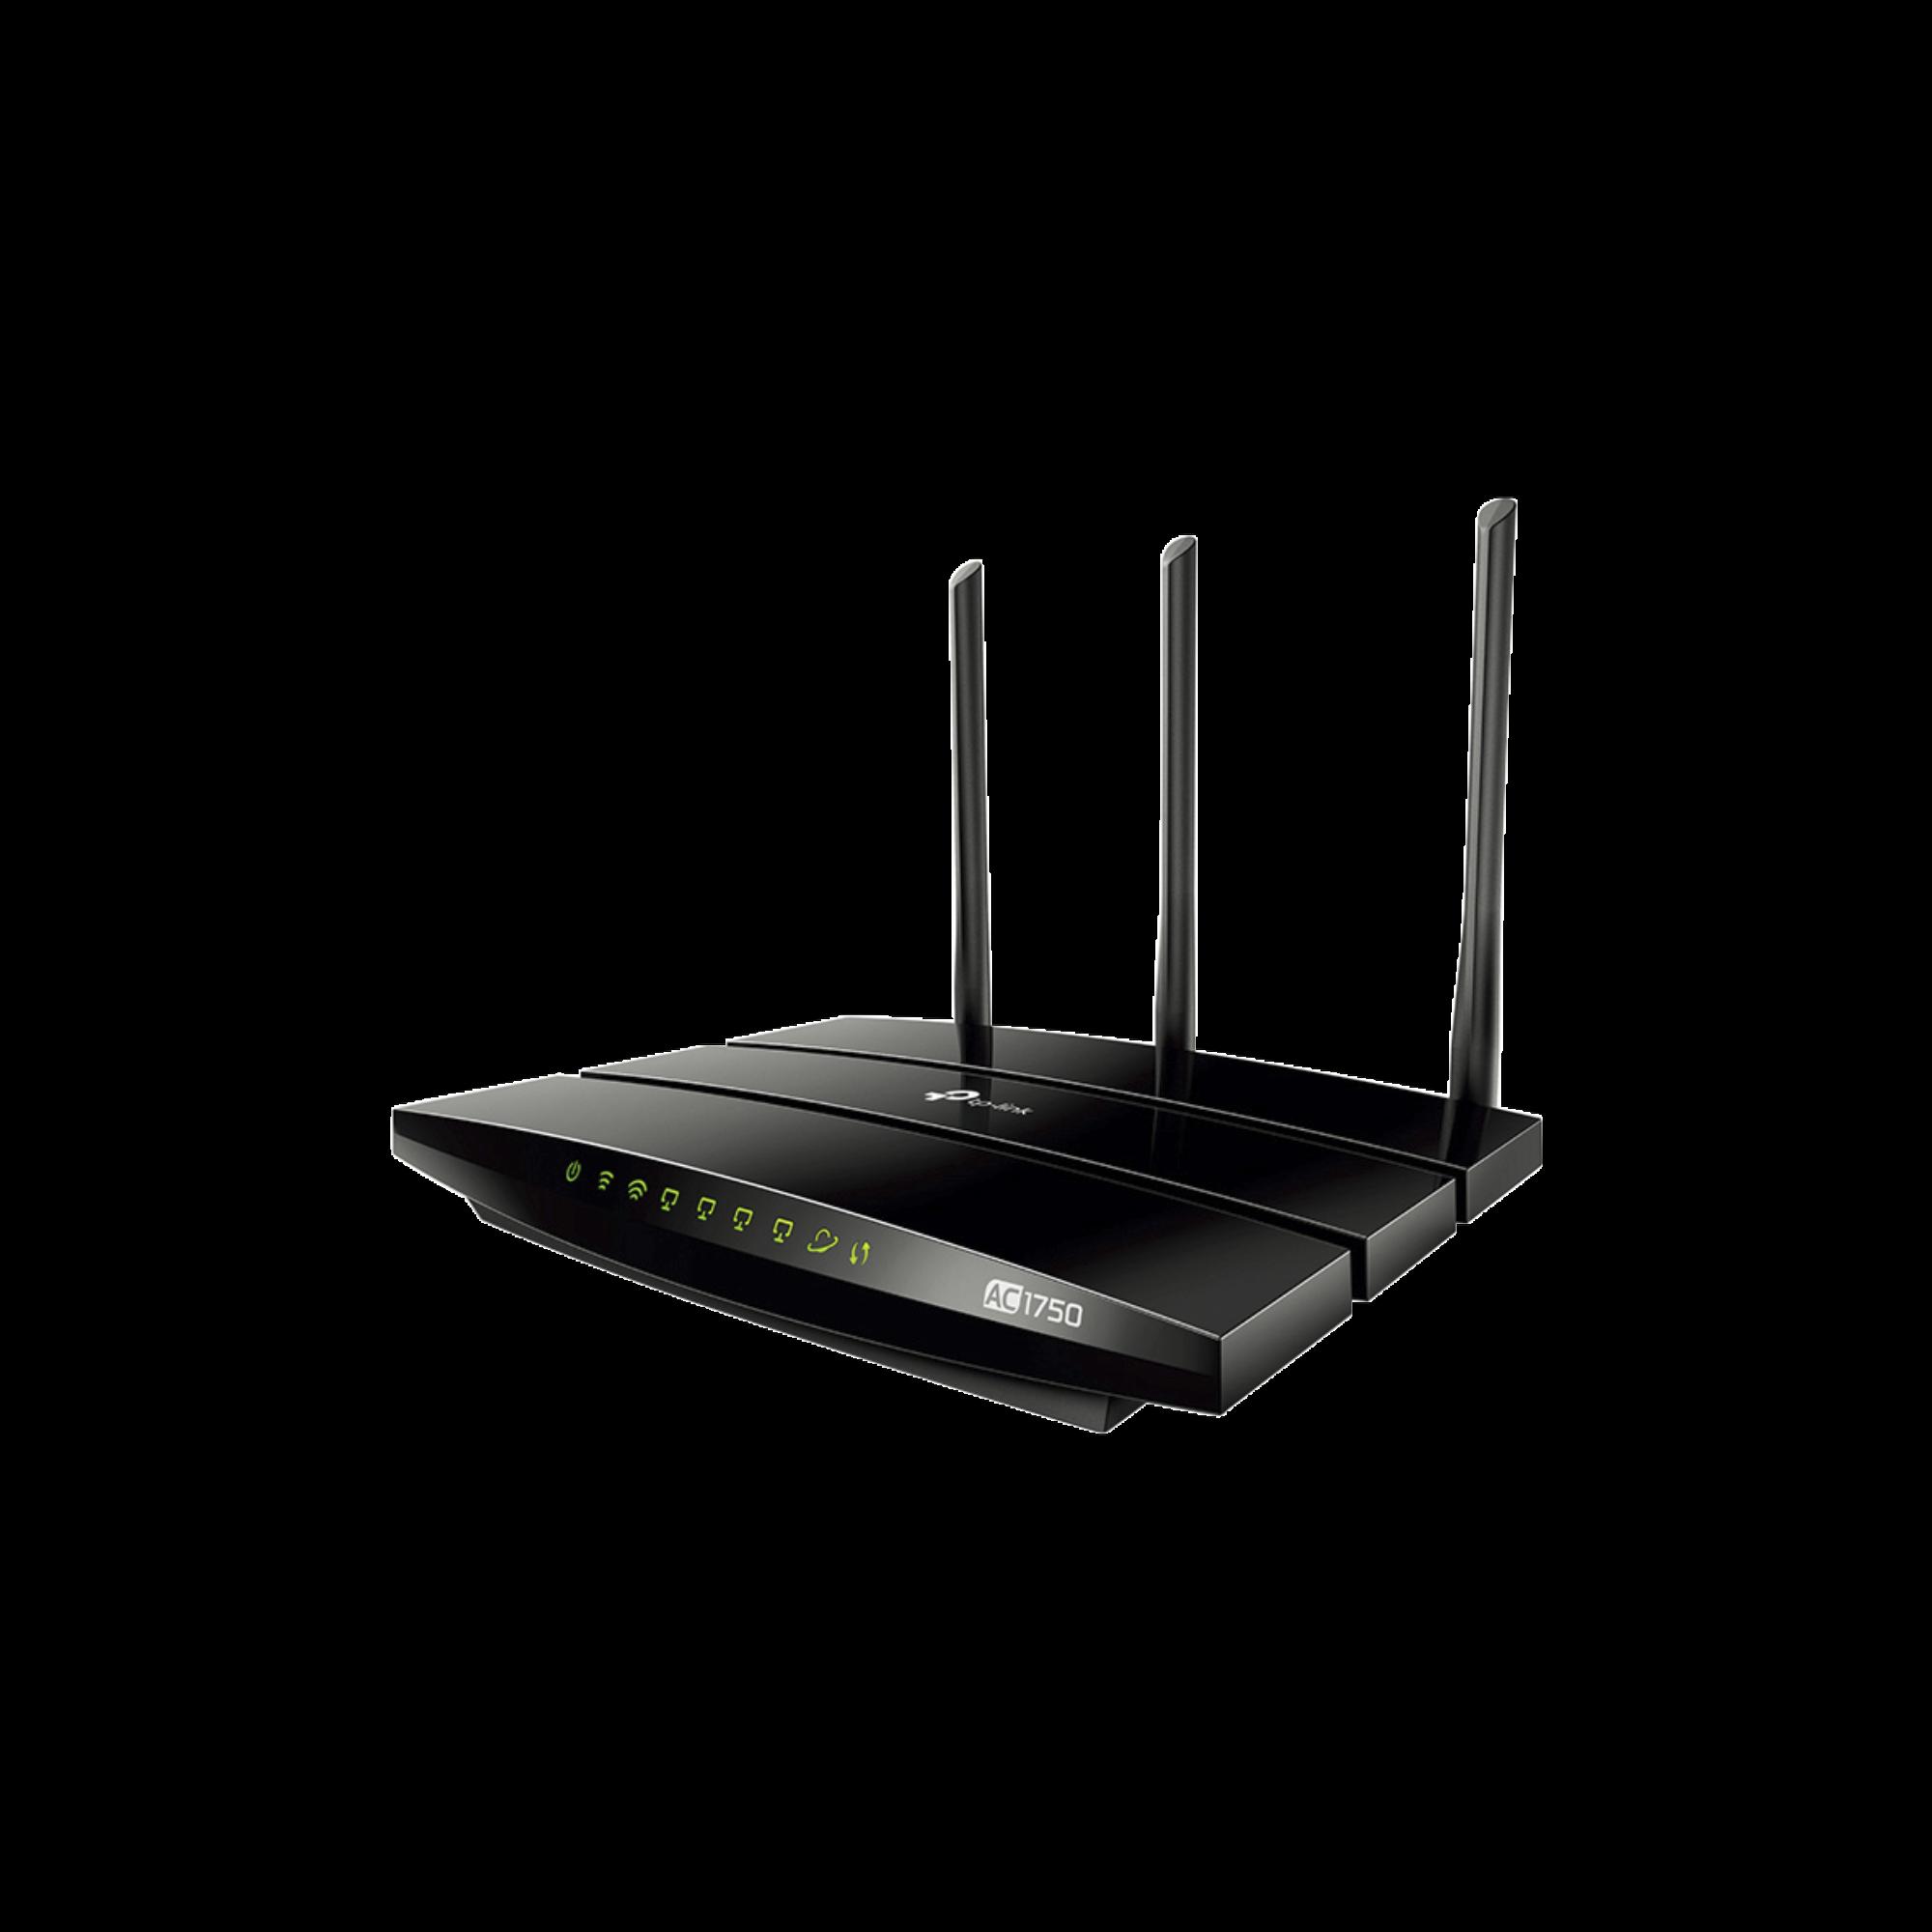 Router inalámbrico AC 1750 doble banda 1 puerto WAN 10/100/1000 Mbps Y  4 puertos LAN 10/100/1000 Mbps, 2 puertos USB 2.0